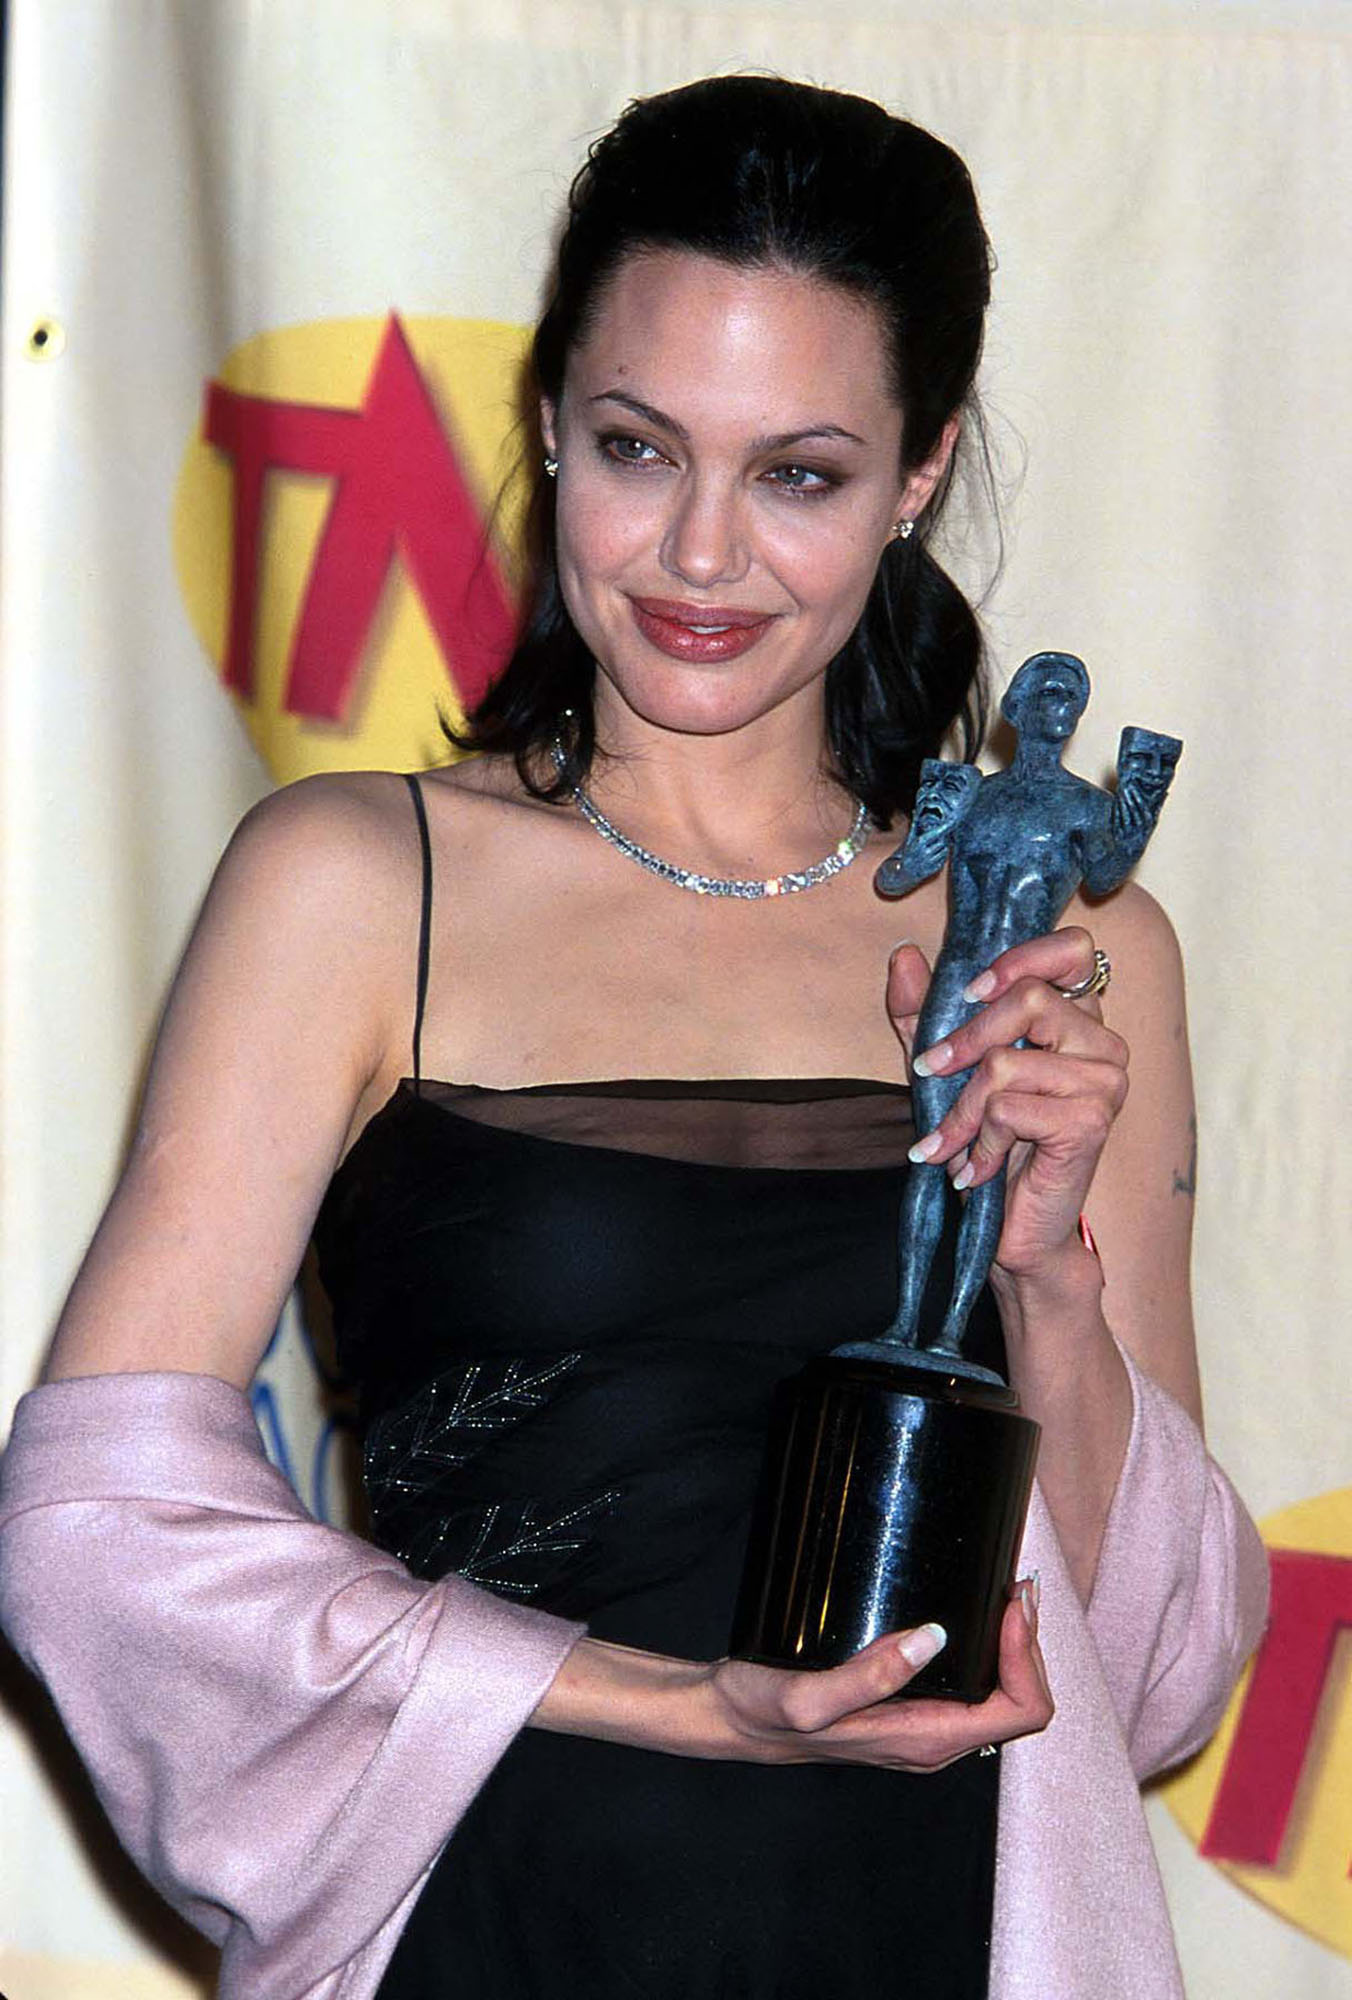 Angie S Rainbow Awards Of Angelina Jolie